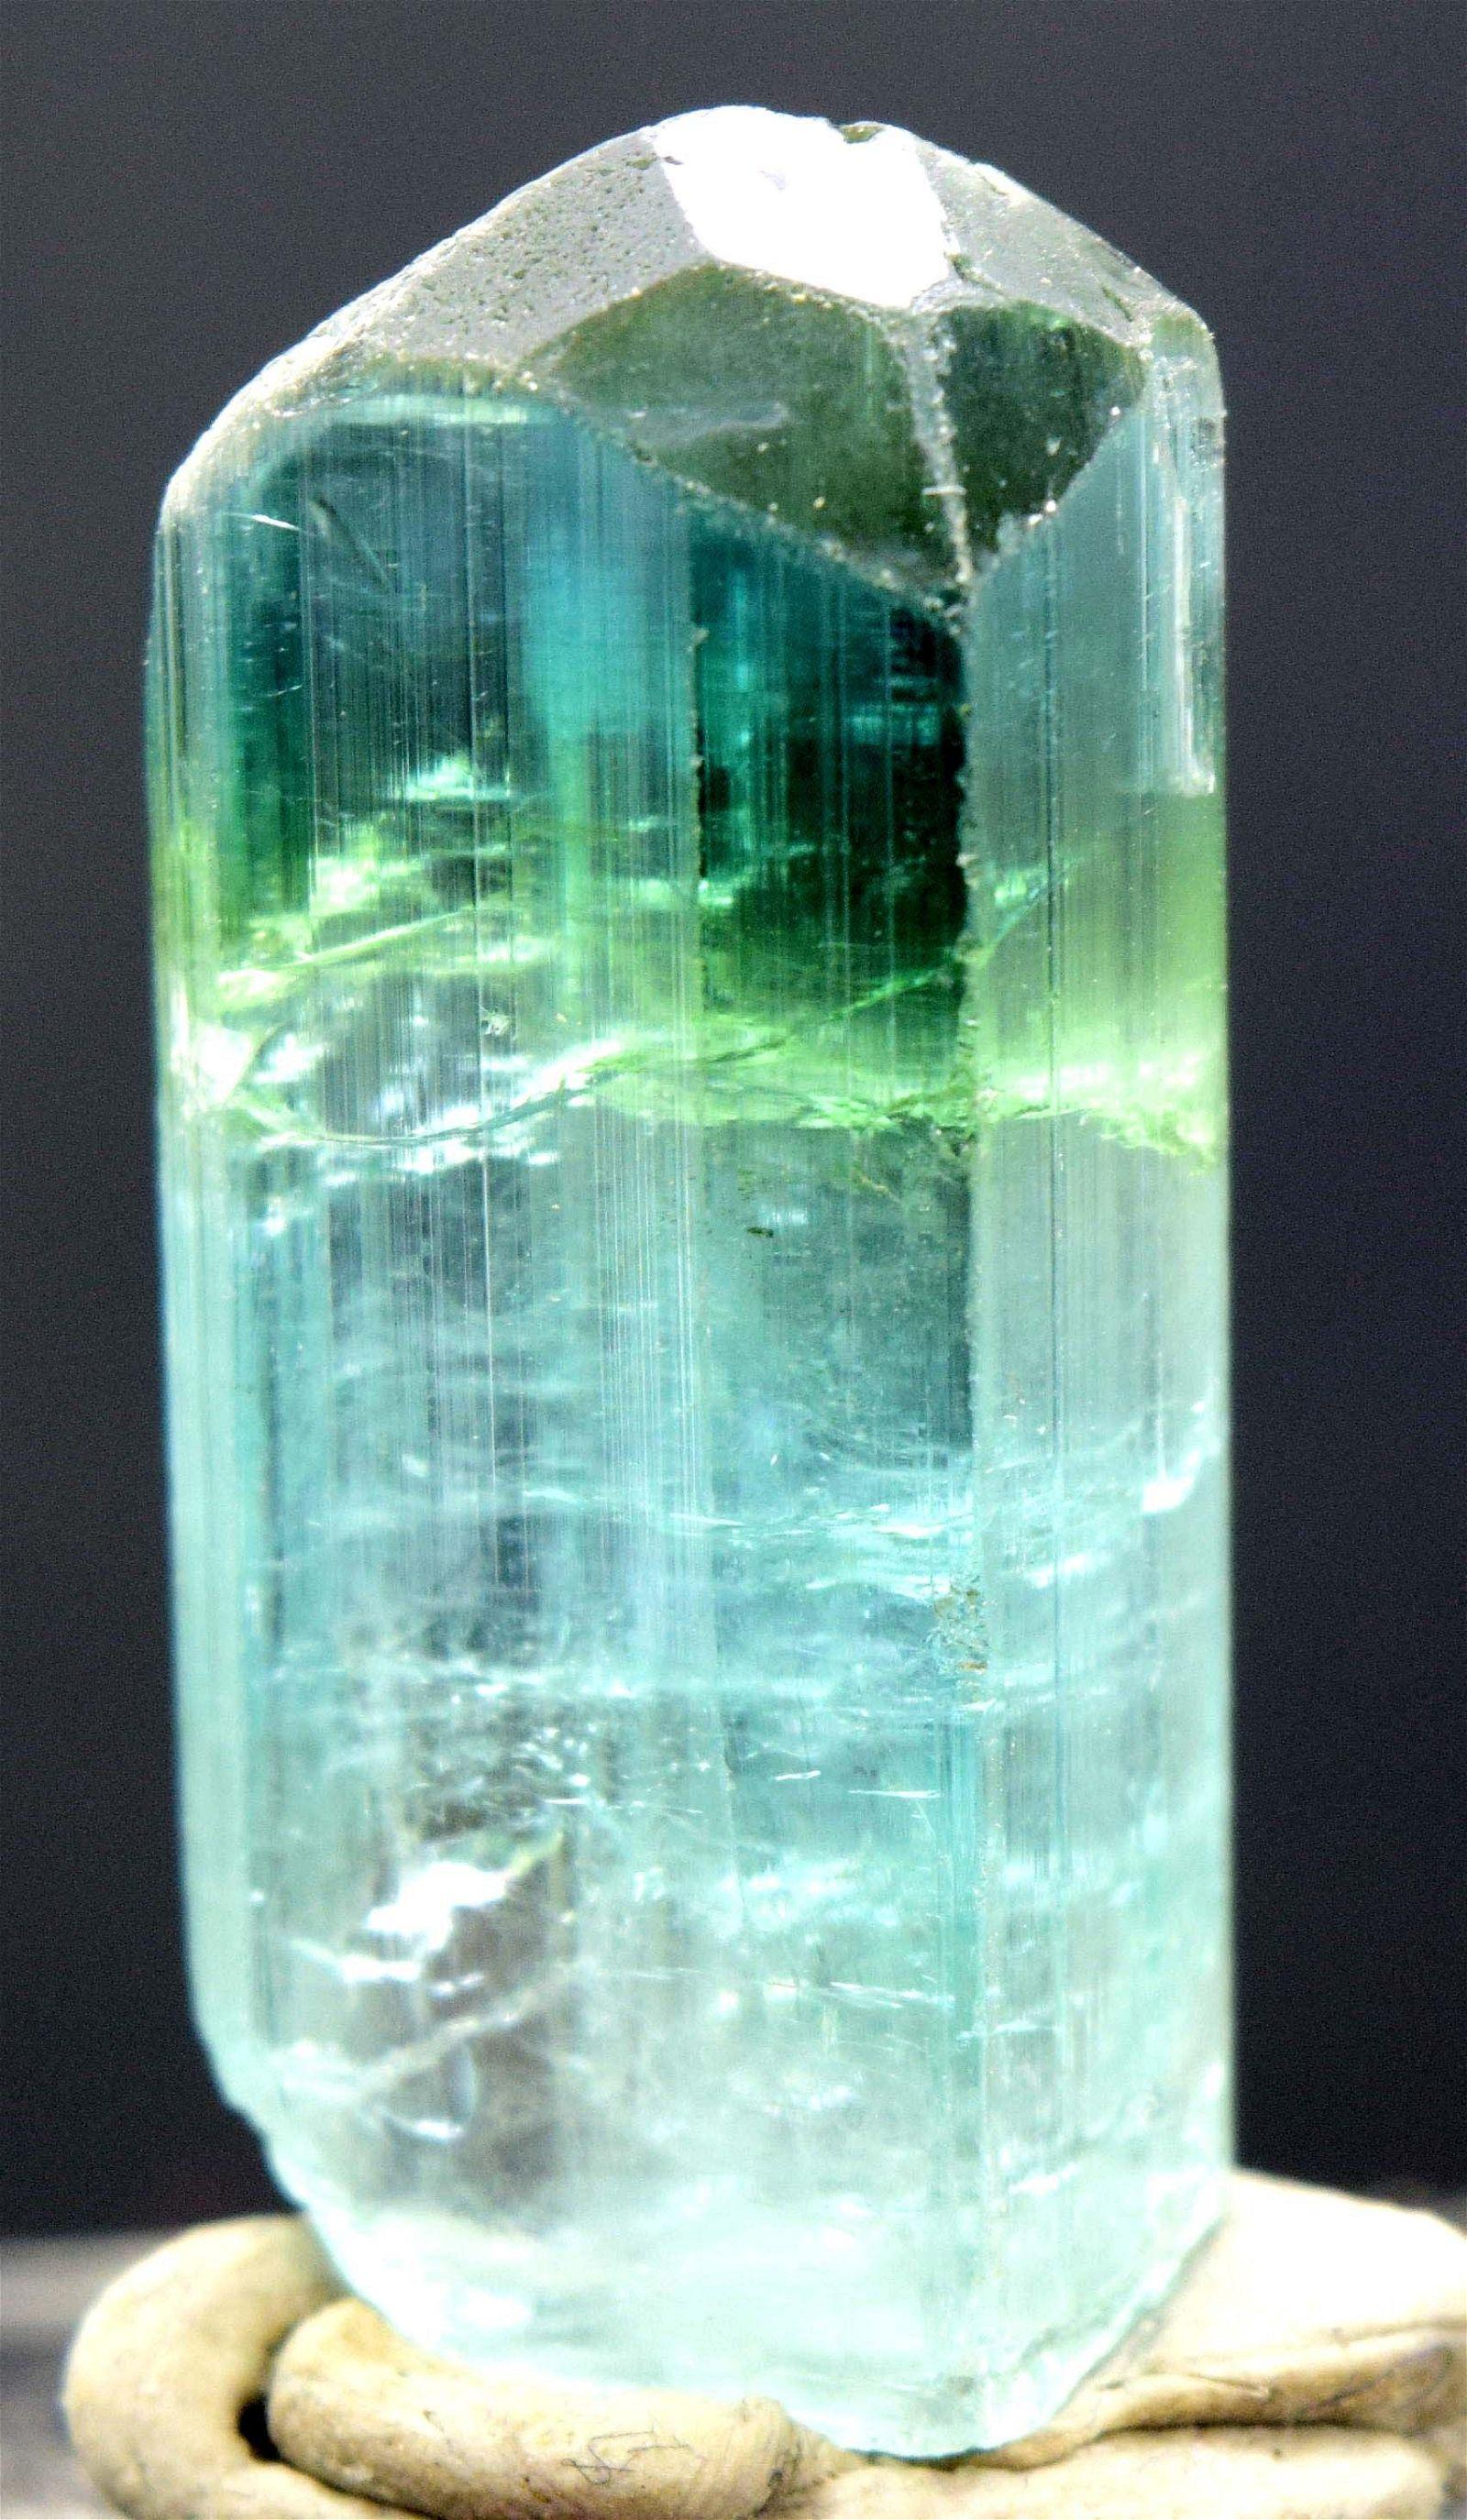 MP01-330 , 71.60 carats Terminated Gem Grade Sea Foam